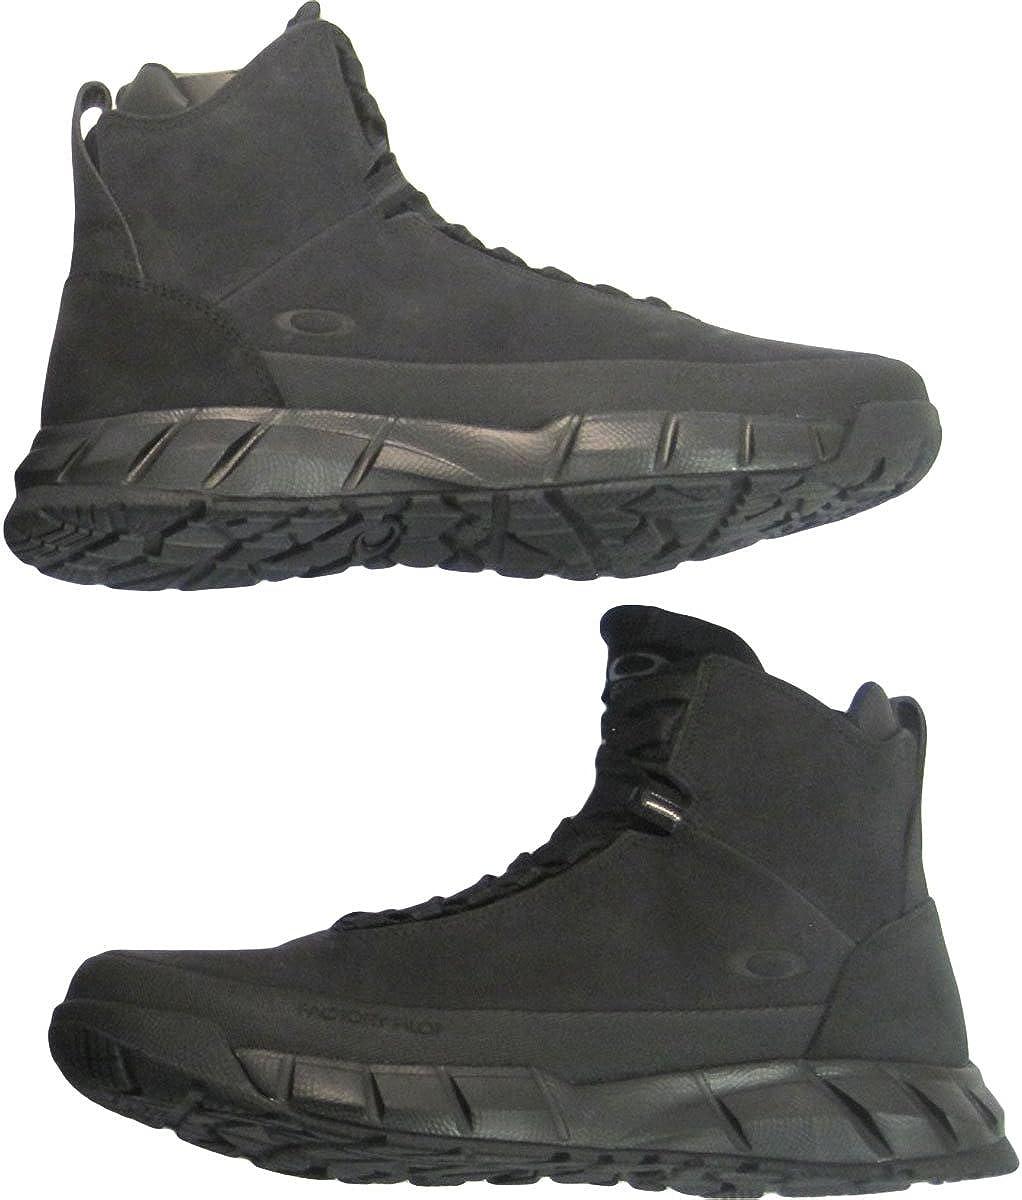 Oakley Mens FP Military Boots,11,Blackout: Amazon.es: Zapatos y ...